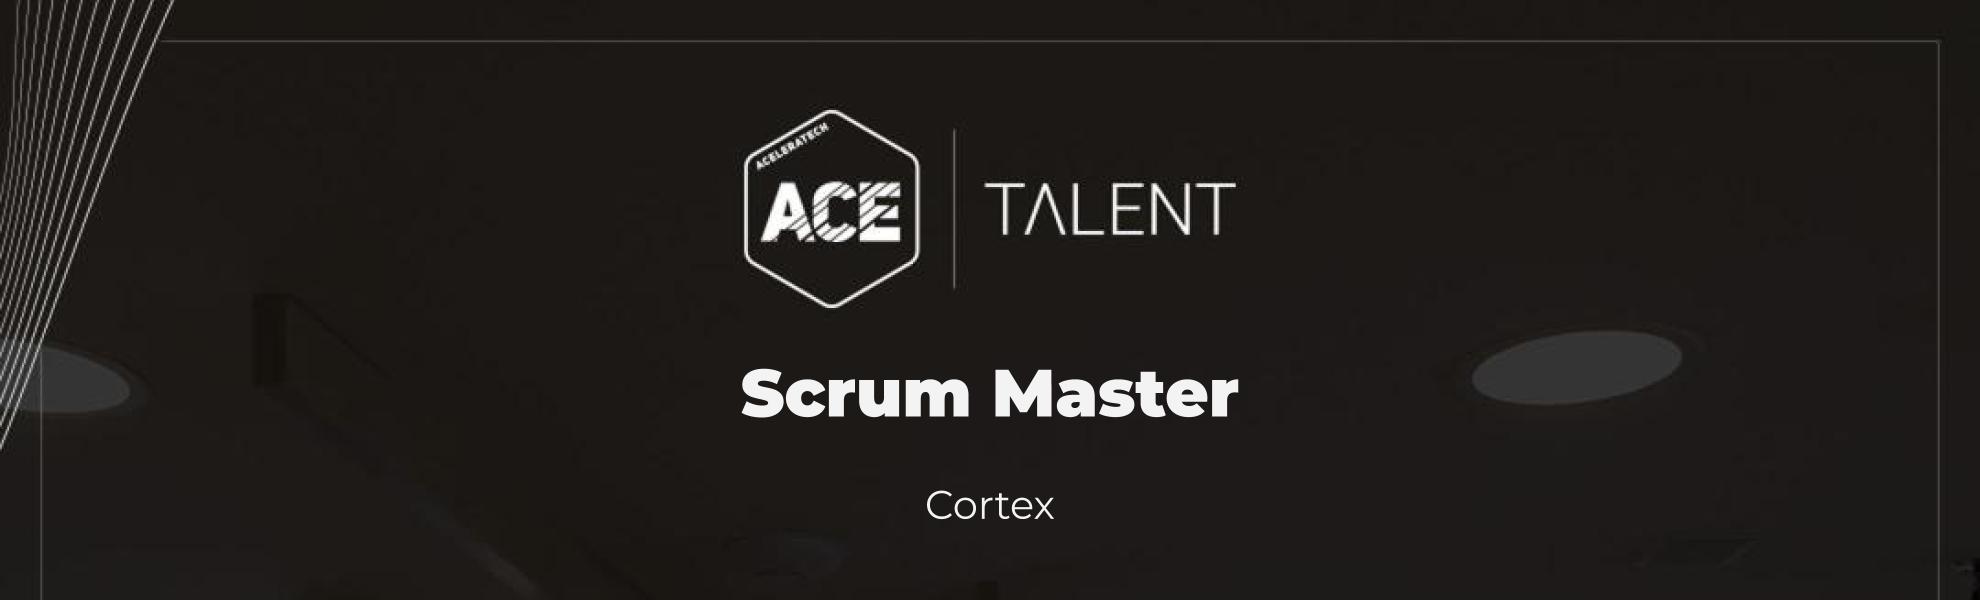 Scrum Master - São Paulo